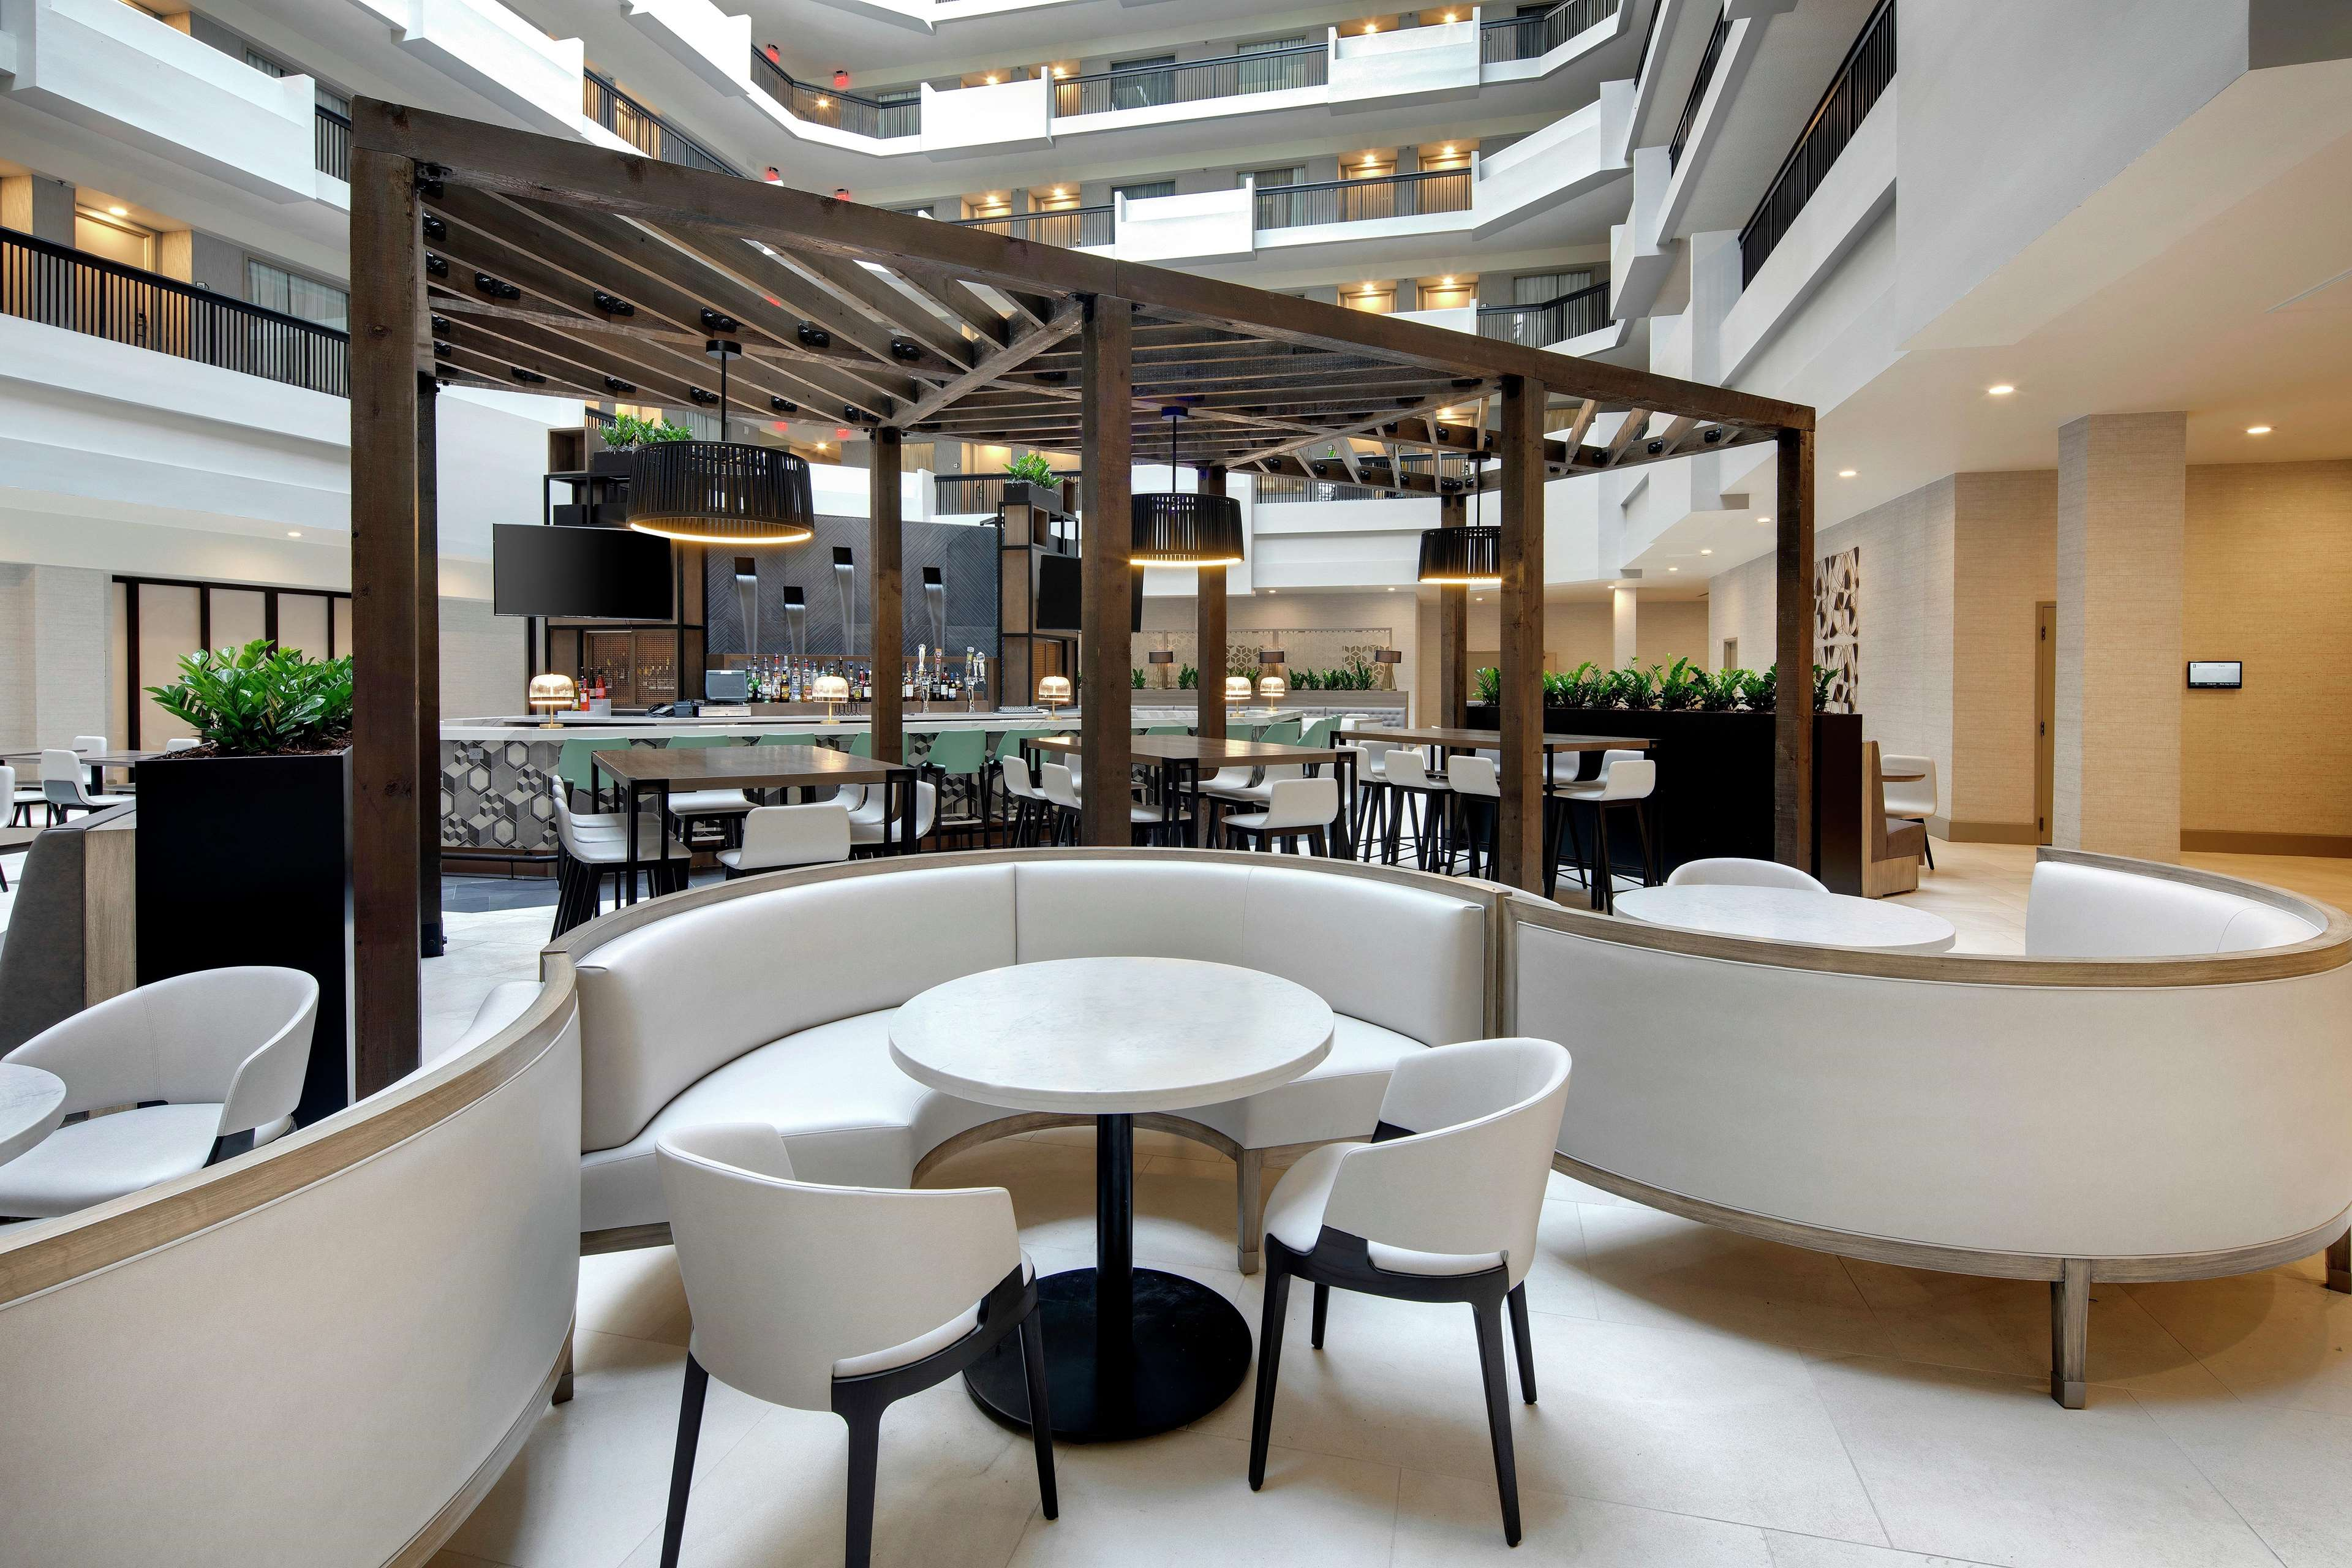 Embassy Suites by Hilton Atlanta Perimeter Center